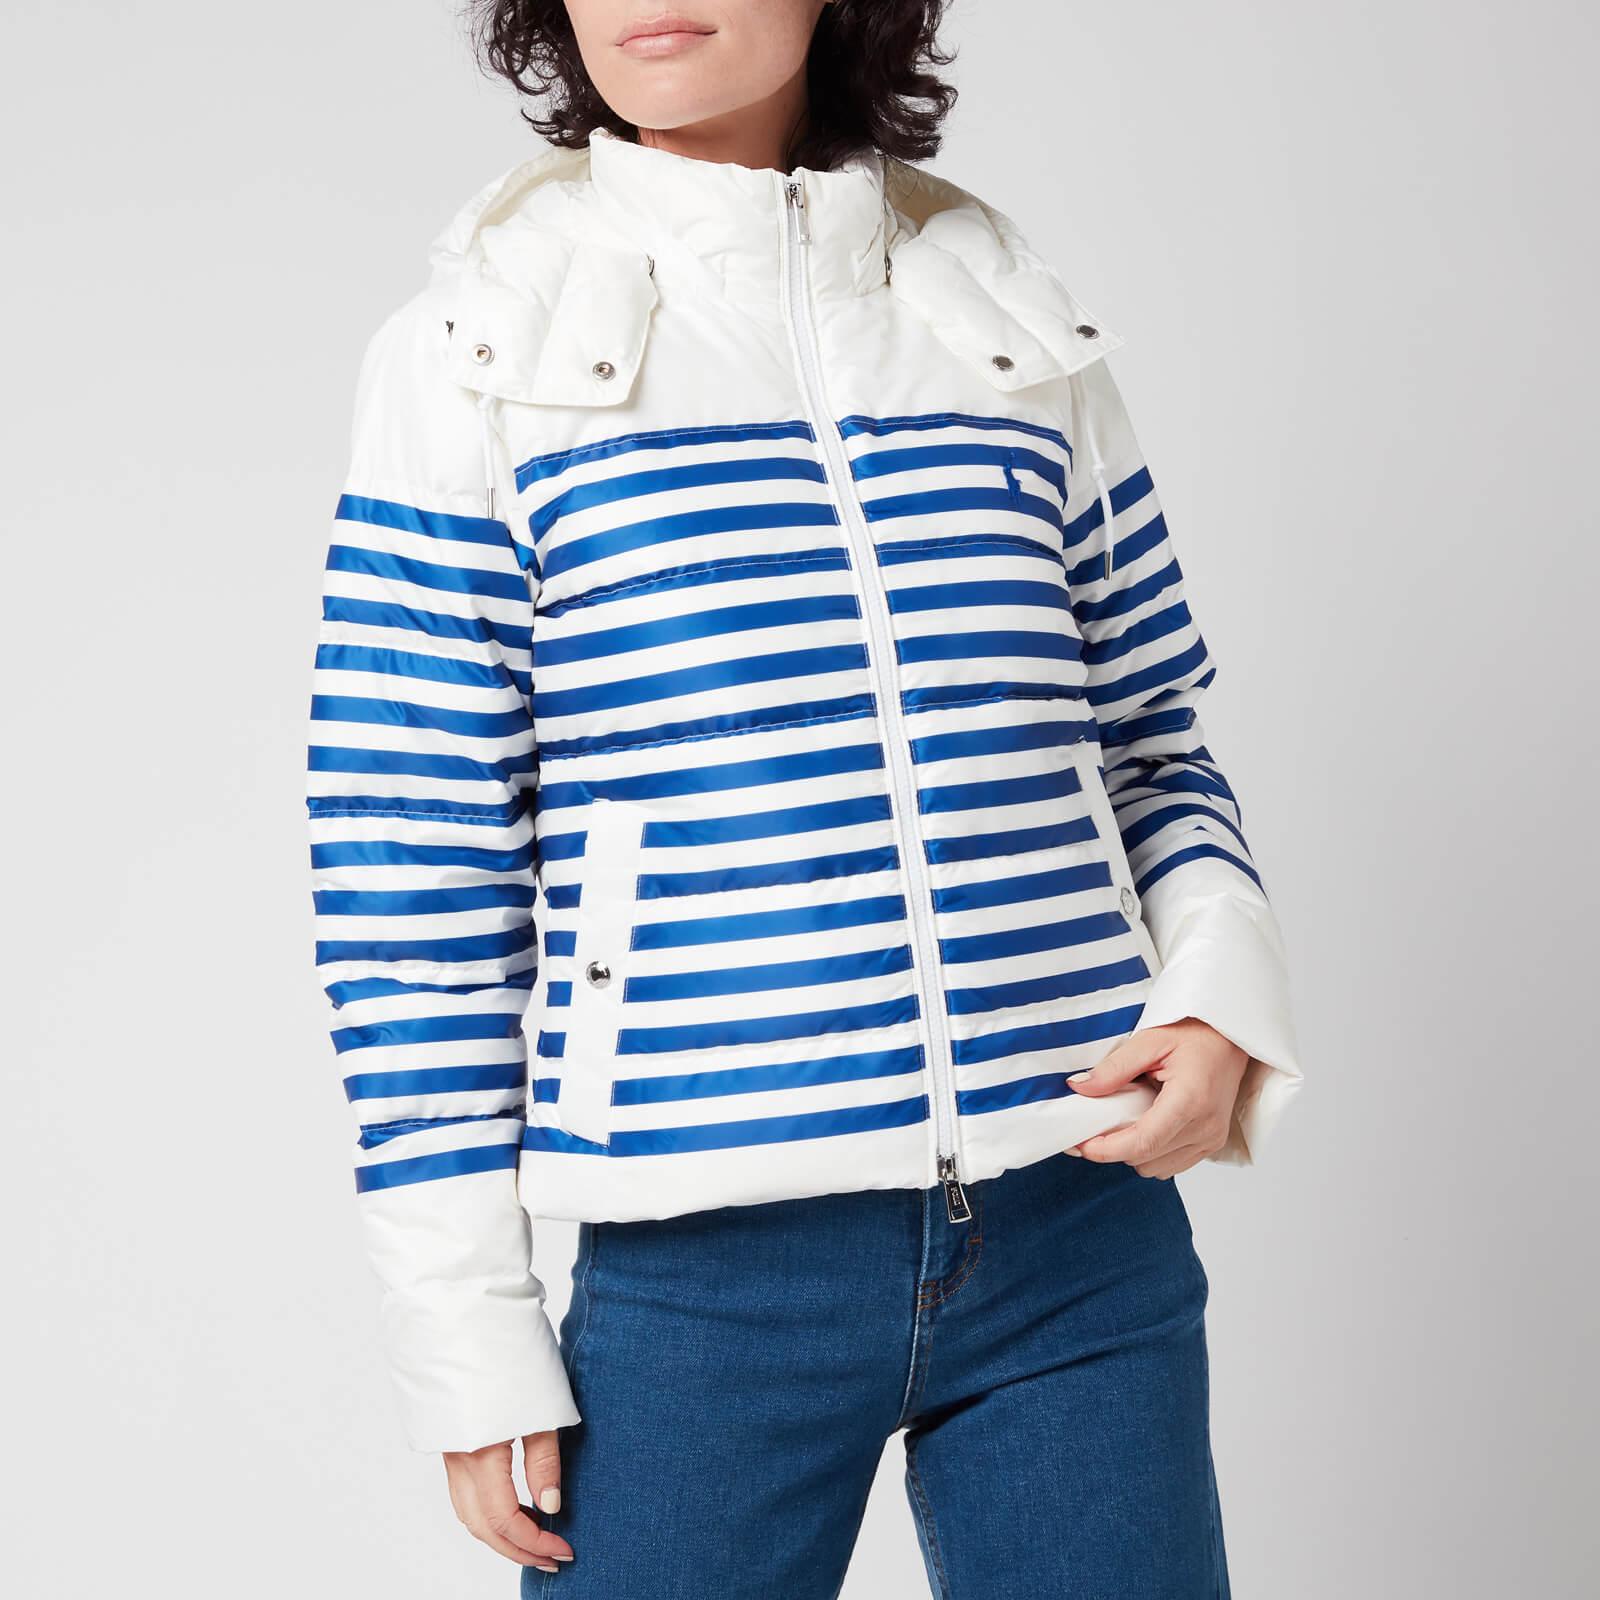 Polo Ralph Lauren Women's Down Fill Jacket - White/Blue Stripe